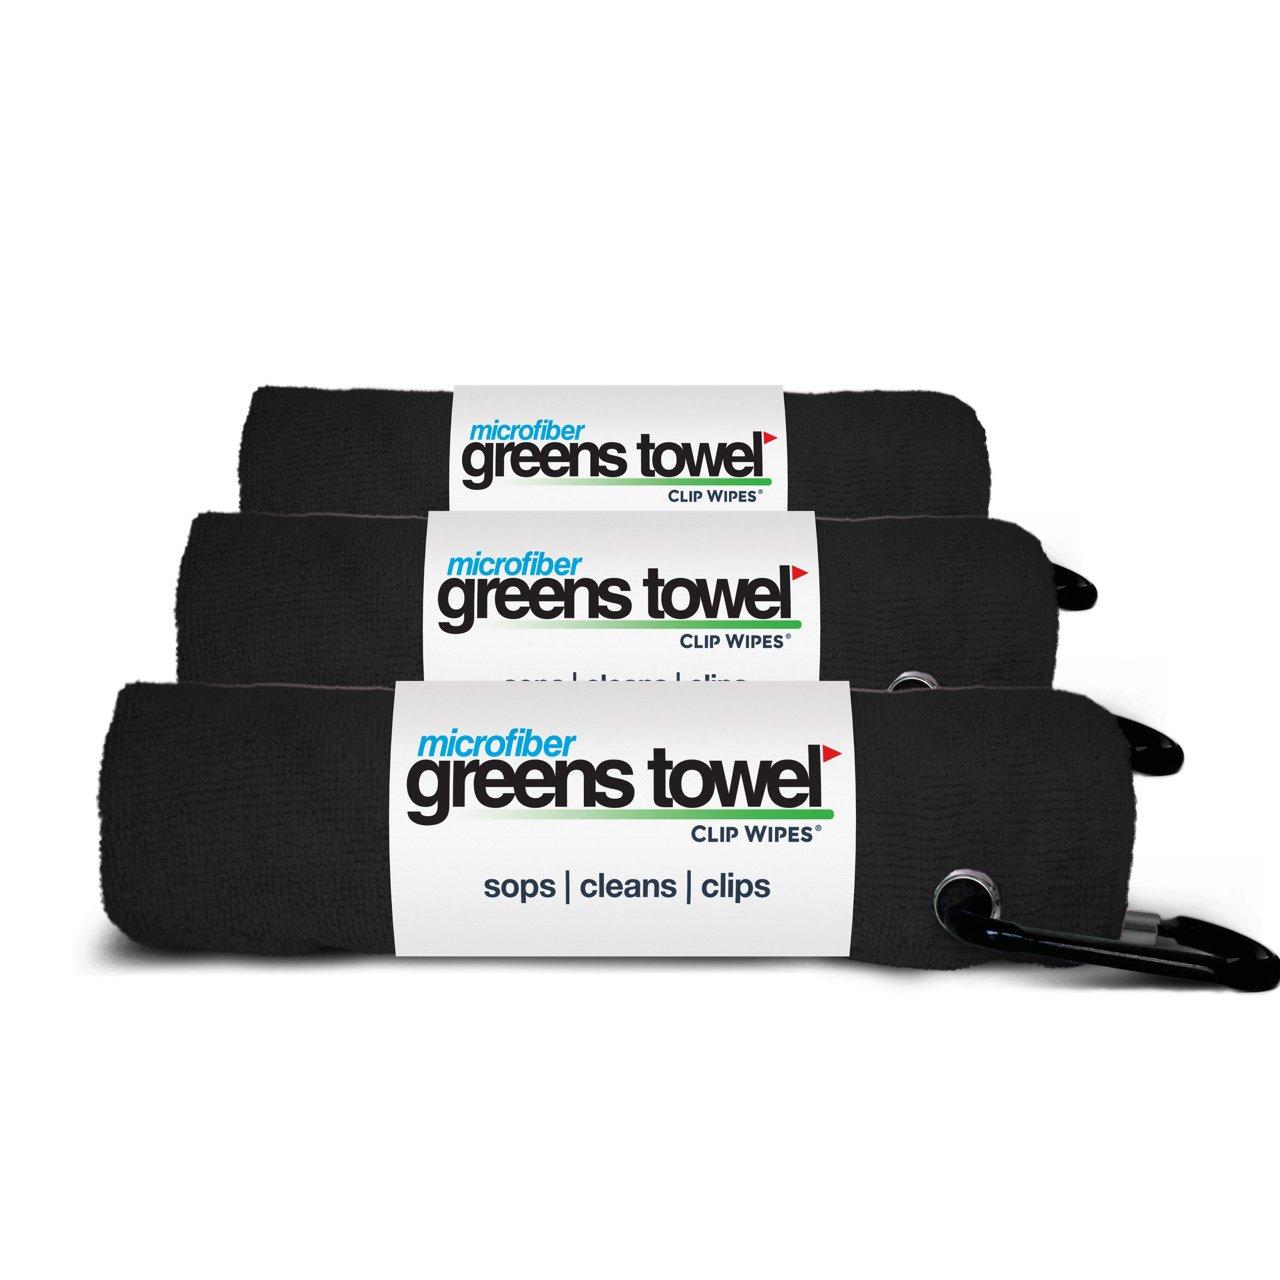 3 Pack of Jet Black Microfiber Golf Towels by Greens Towel